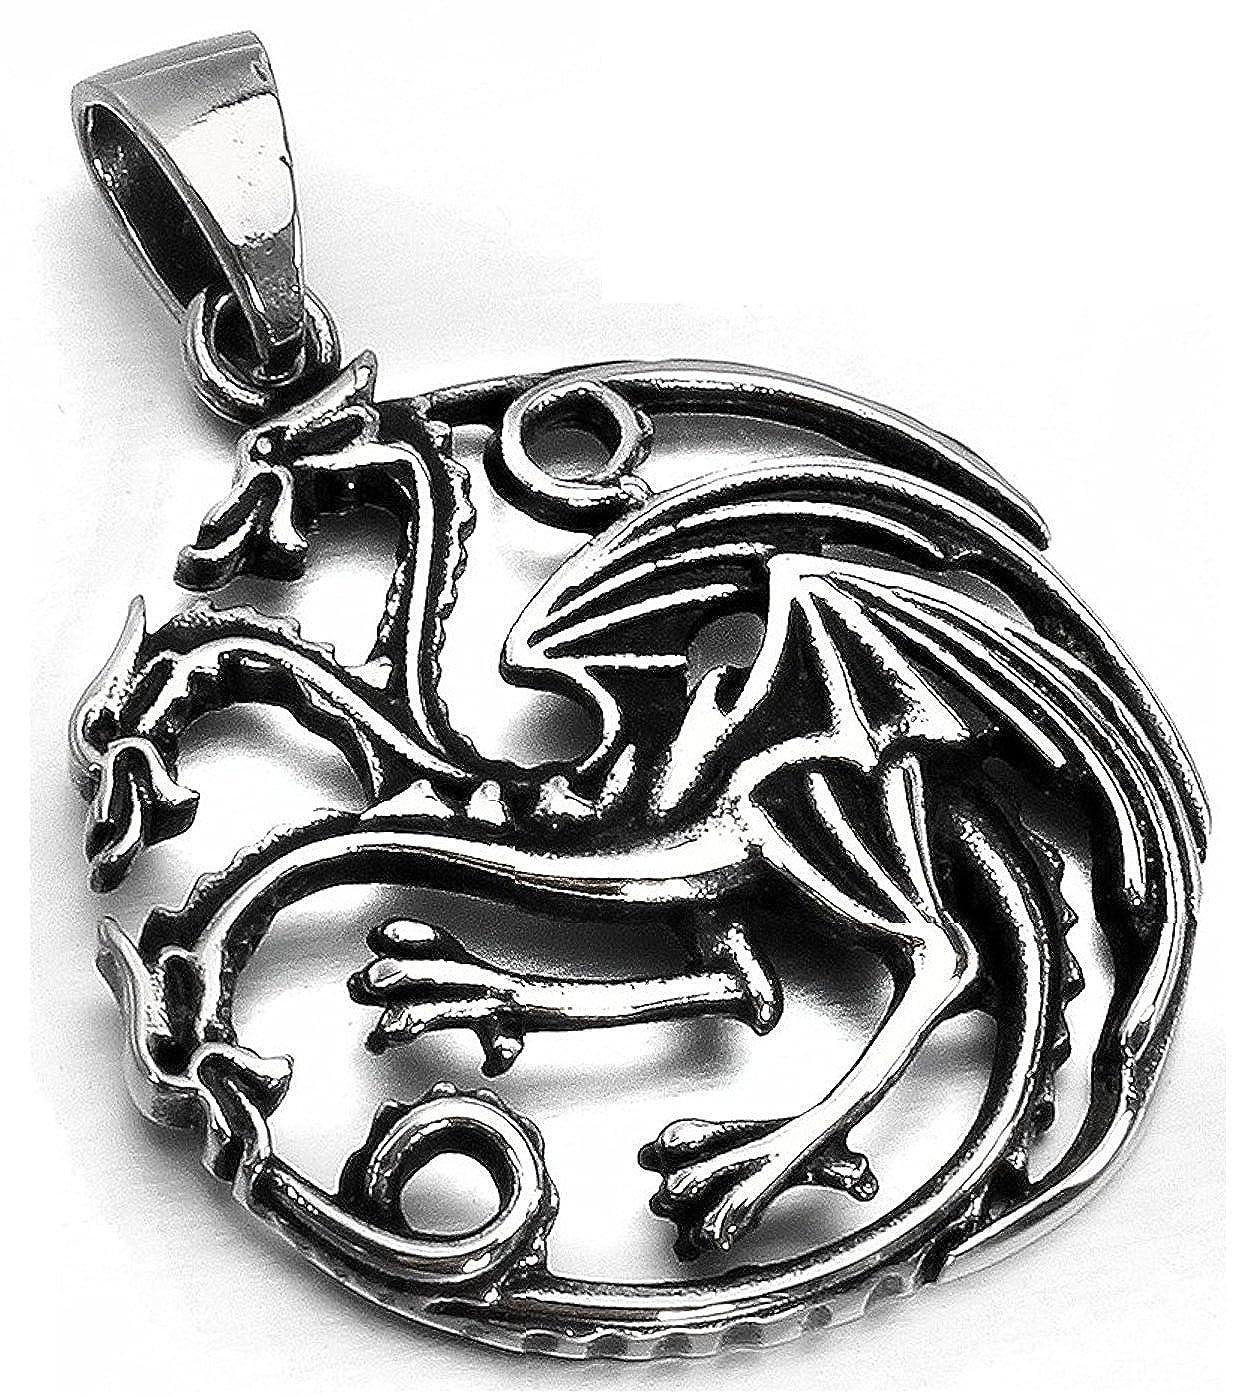 MENDINO Jewellery Mens Pendant Necklace 3 Headed Dragon ...